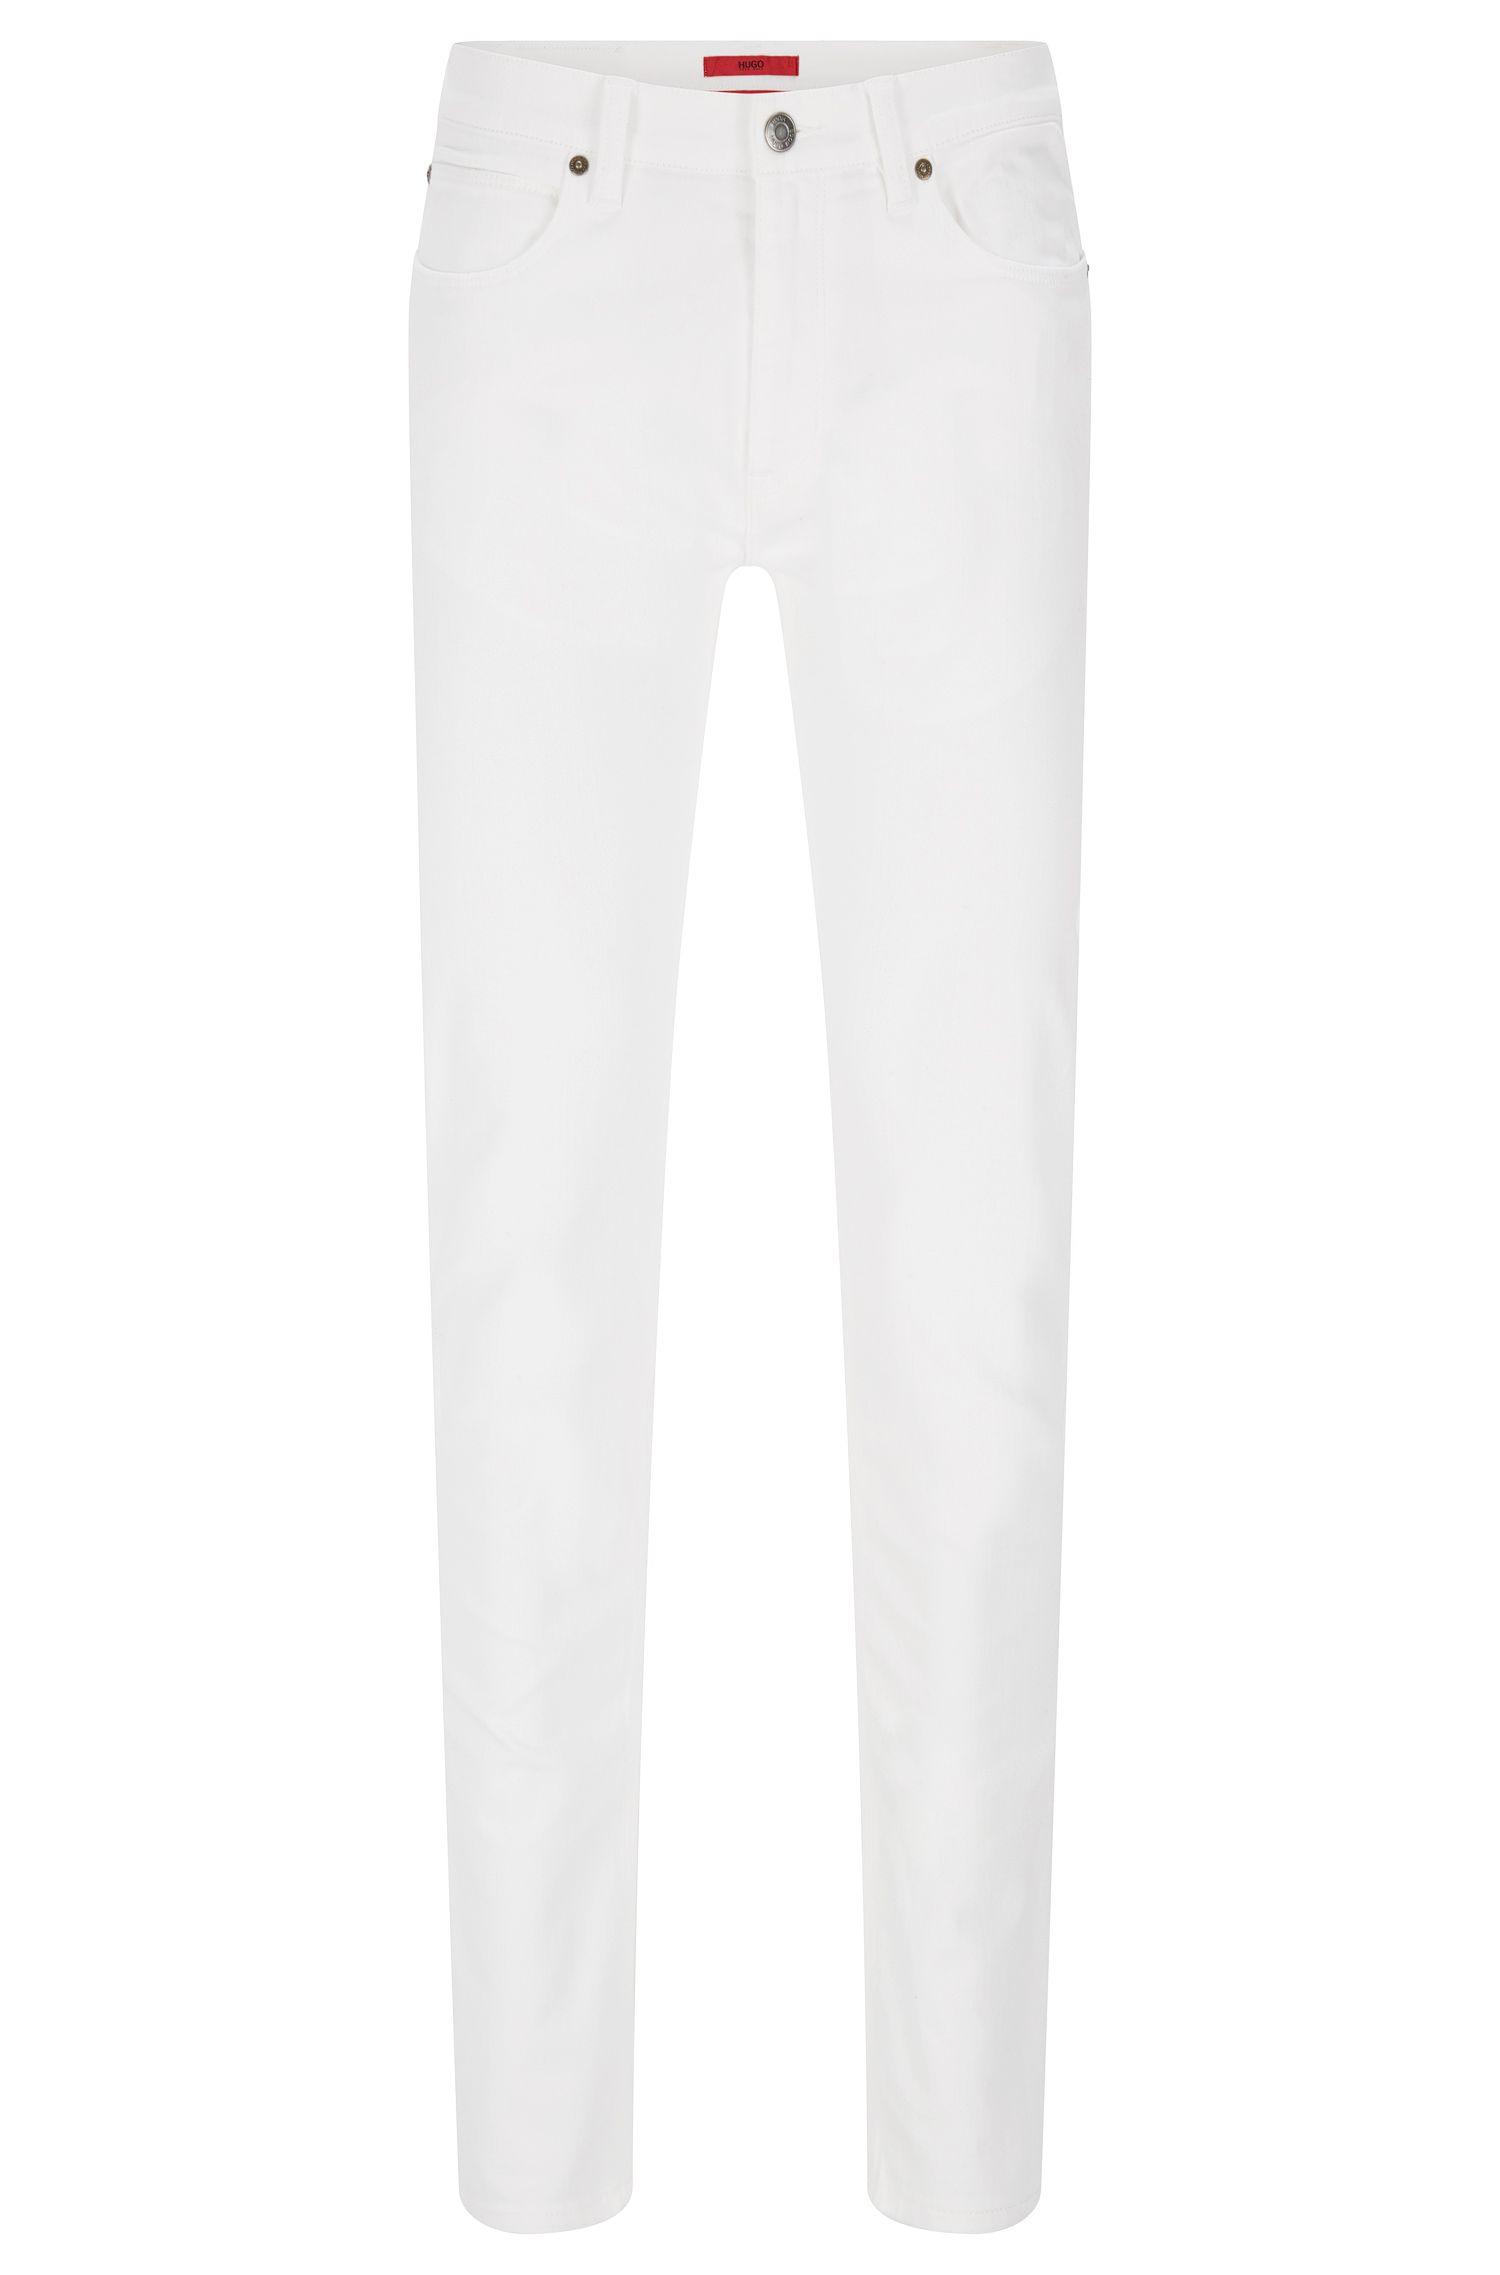 Slim-Fit Jeans aus Baumwoll-Mix im Five-Pocket-Stil: 'HUGO 708'